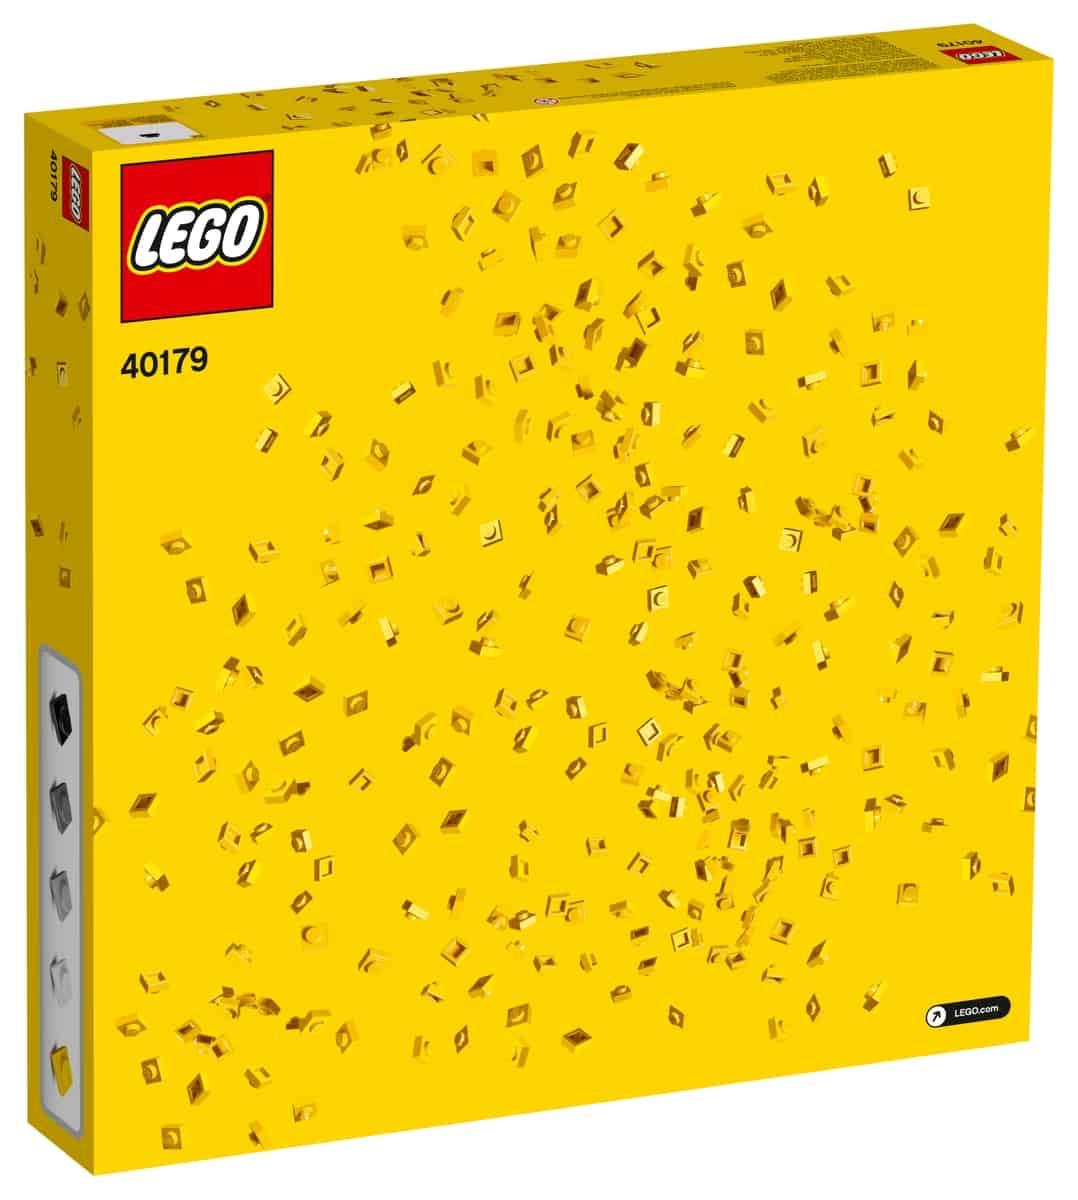 lego 40179 mosaic maker